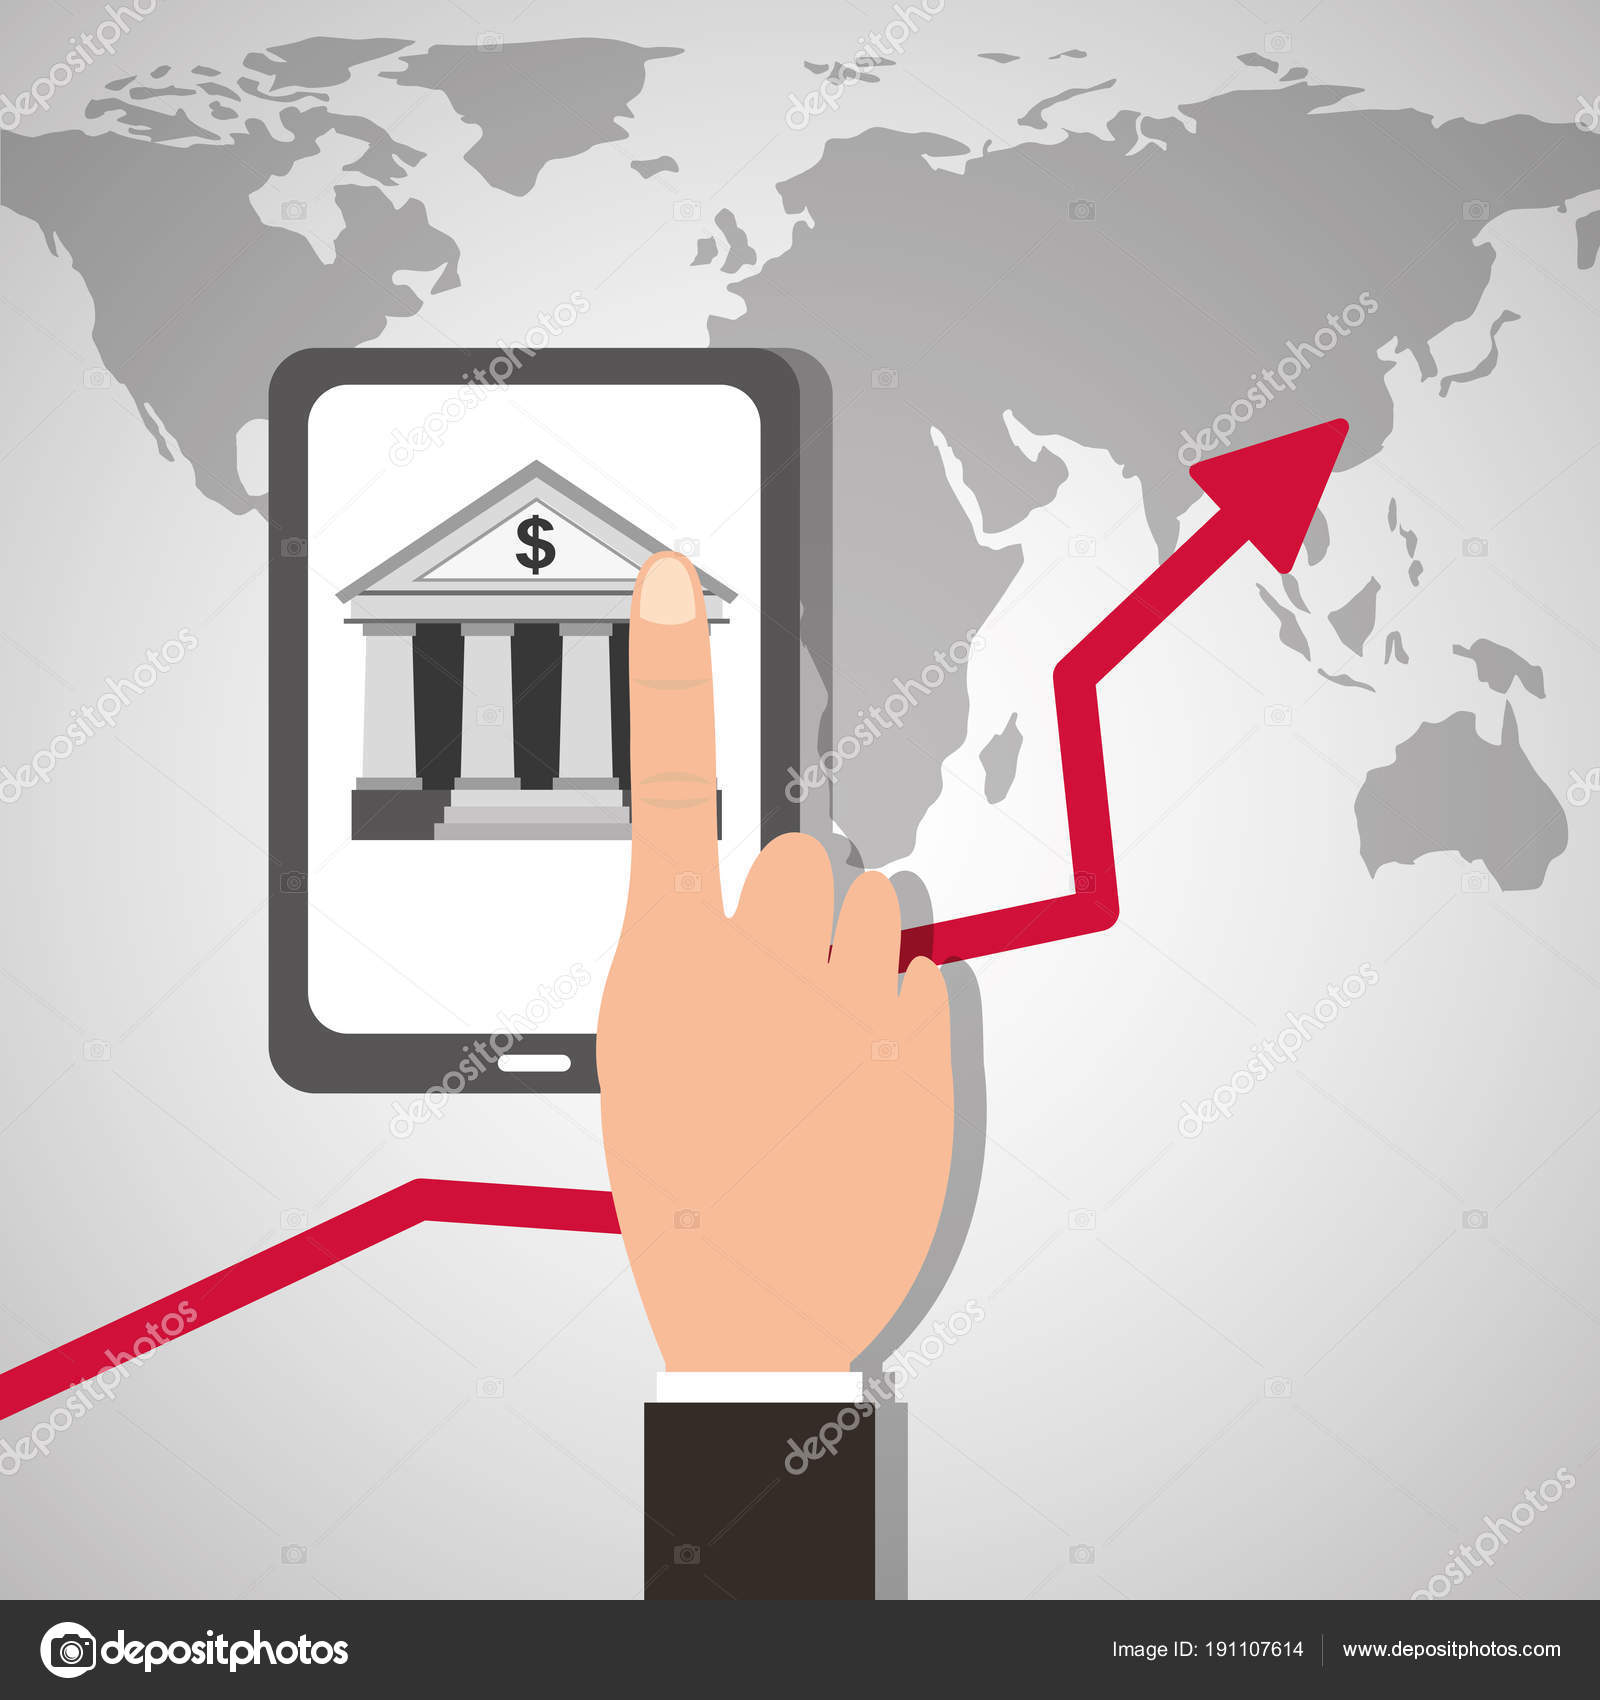 Modern Bankanwendung Pattern - FORTSETZUNG ARBEITSBLATT - tsuhaan.info